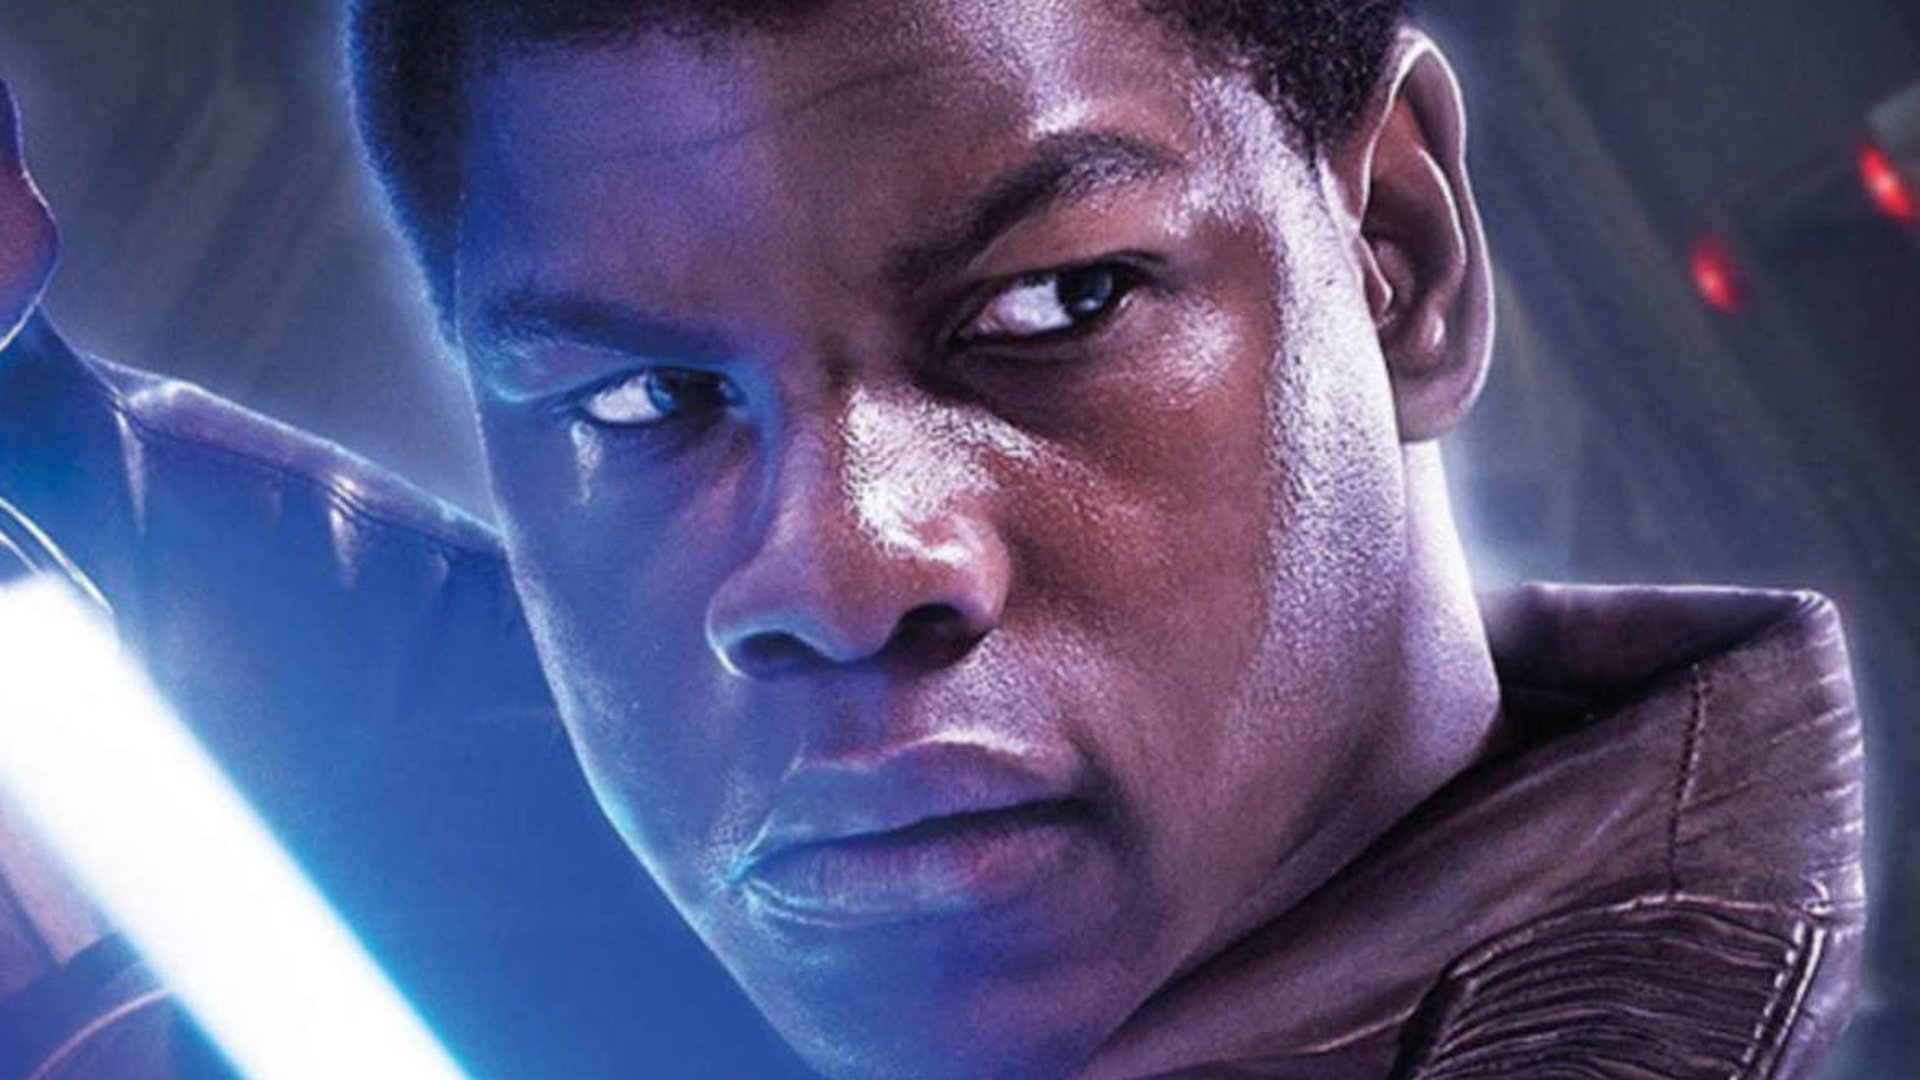 """Aktuelle Saga beendet? ""Star Wars 9""-Star John Boyega kündigt Ausstieg an"""